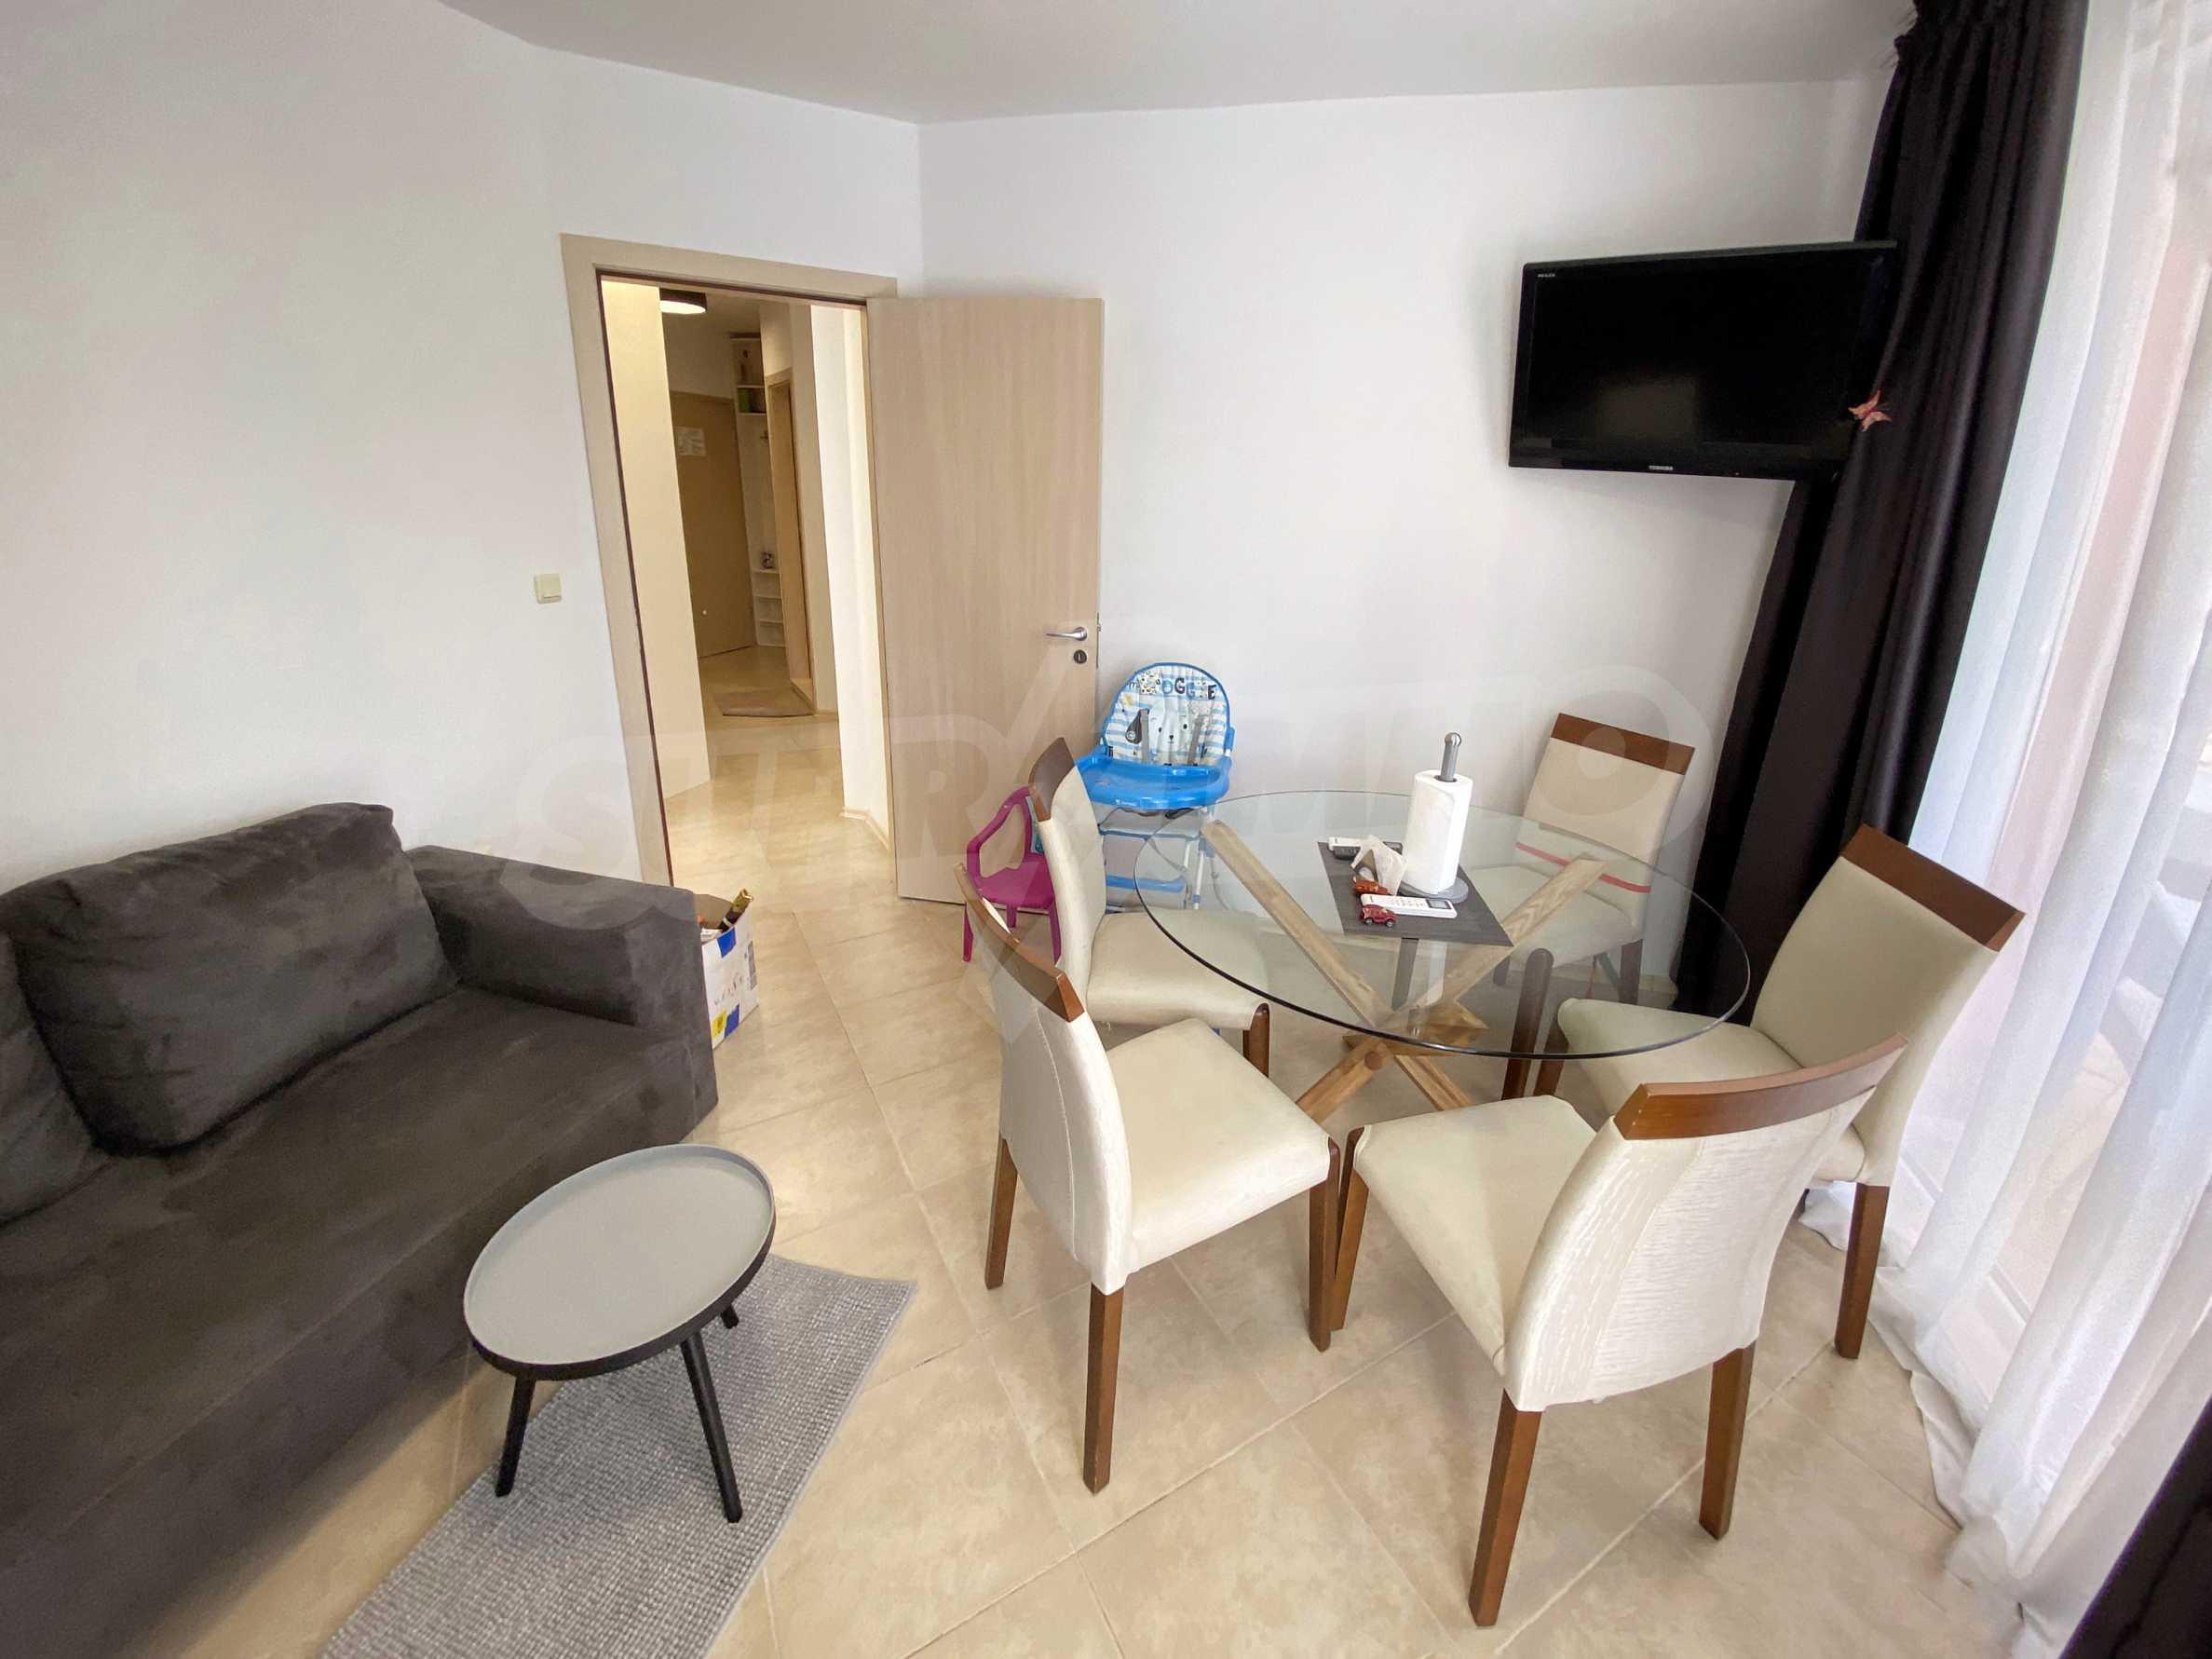 Тристаен апартамент близо до плажа в комплекс Емберли в Лозенец (ап. №201) 10